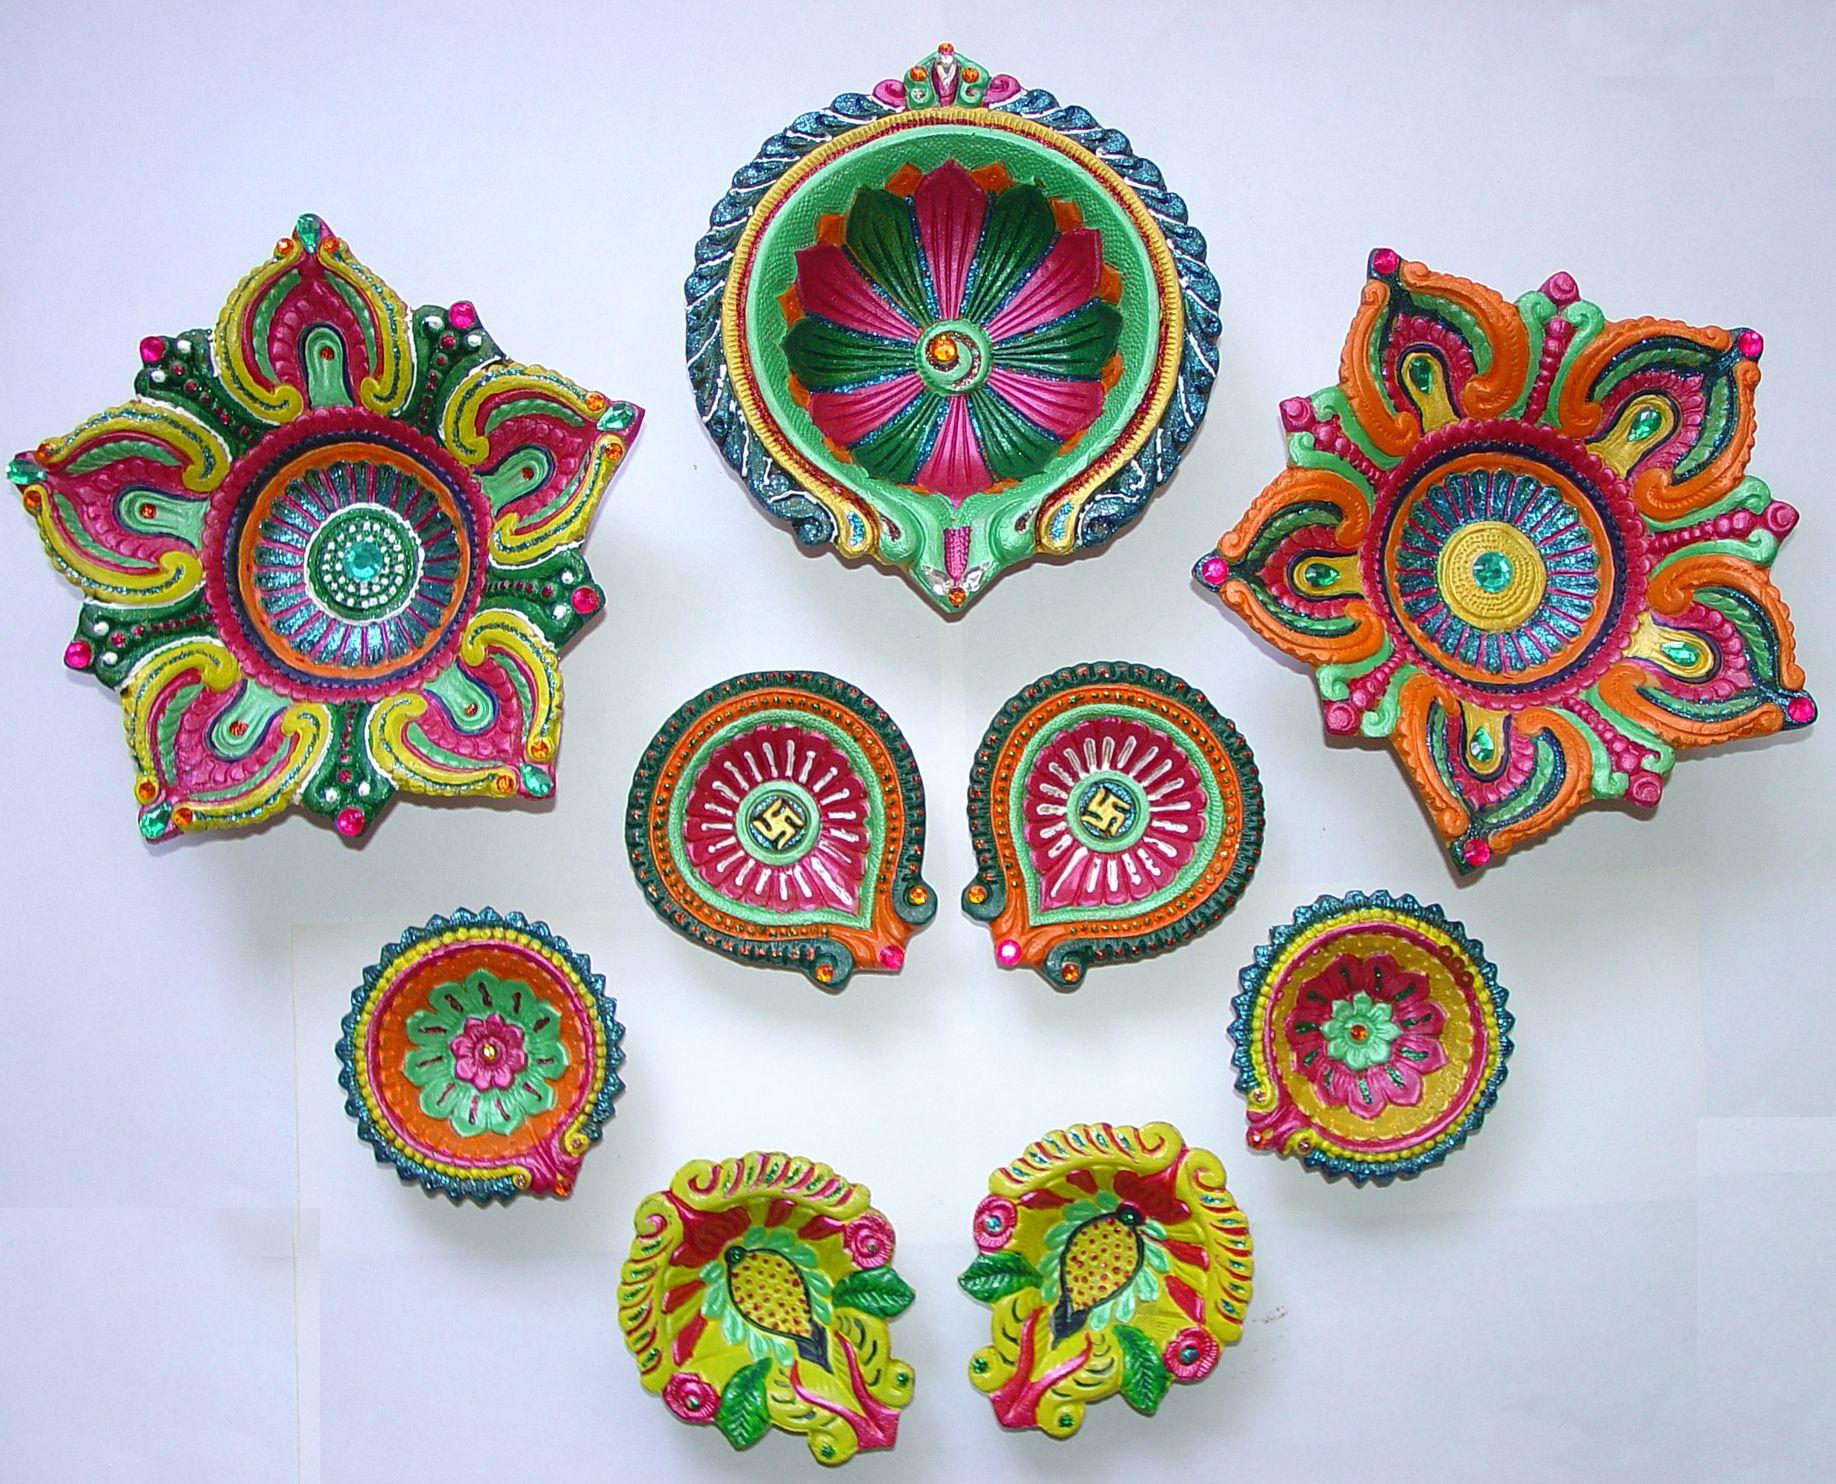 diwali diya festivities pinterest diwali diya diwali and